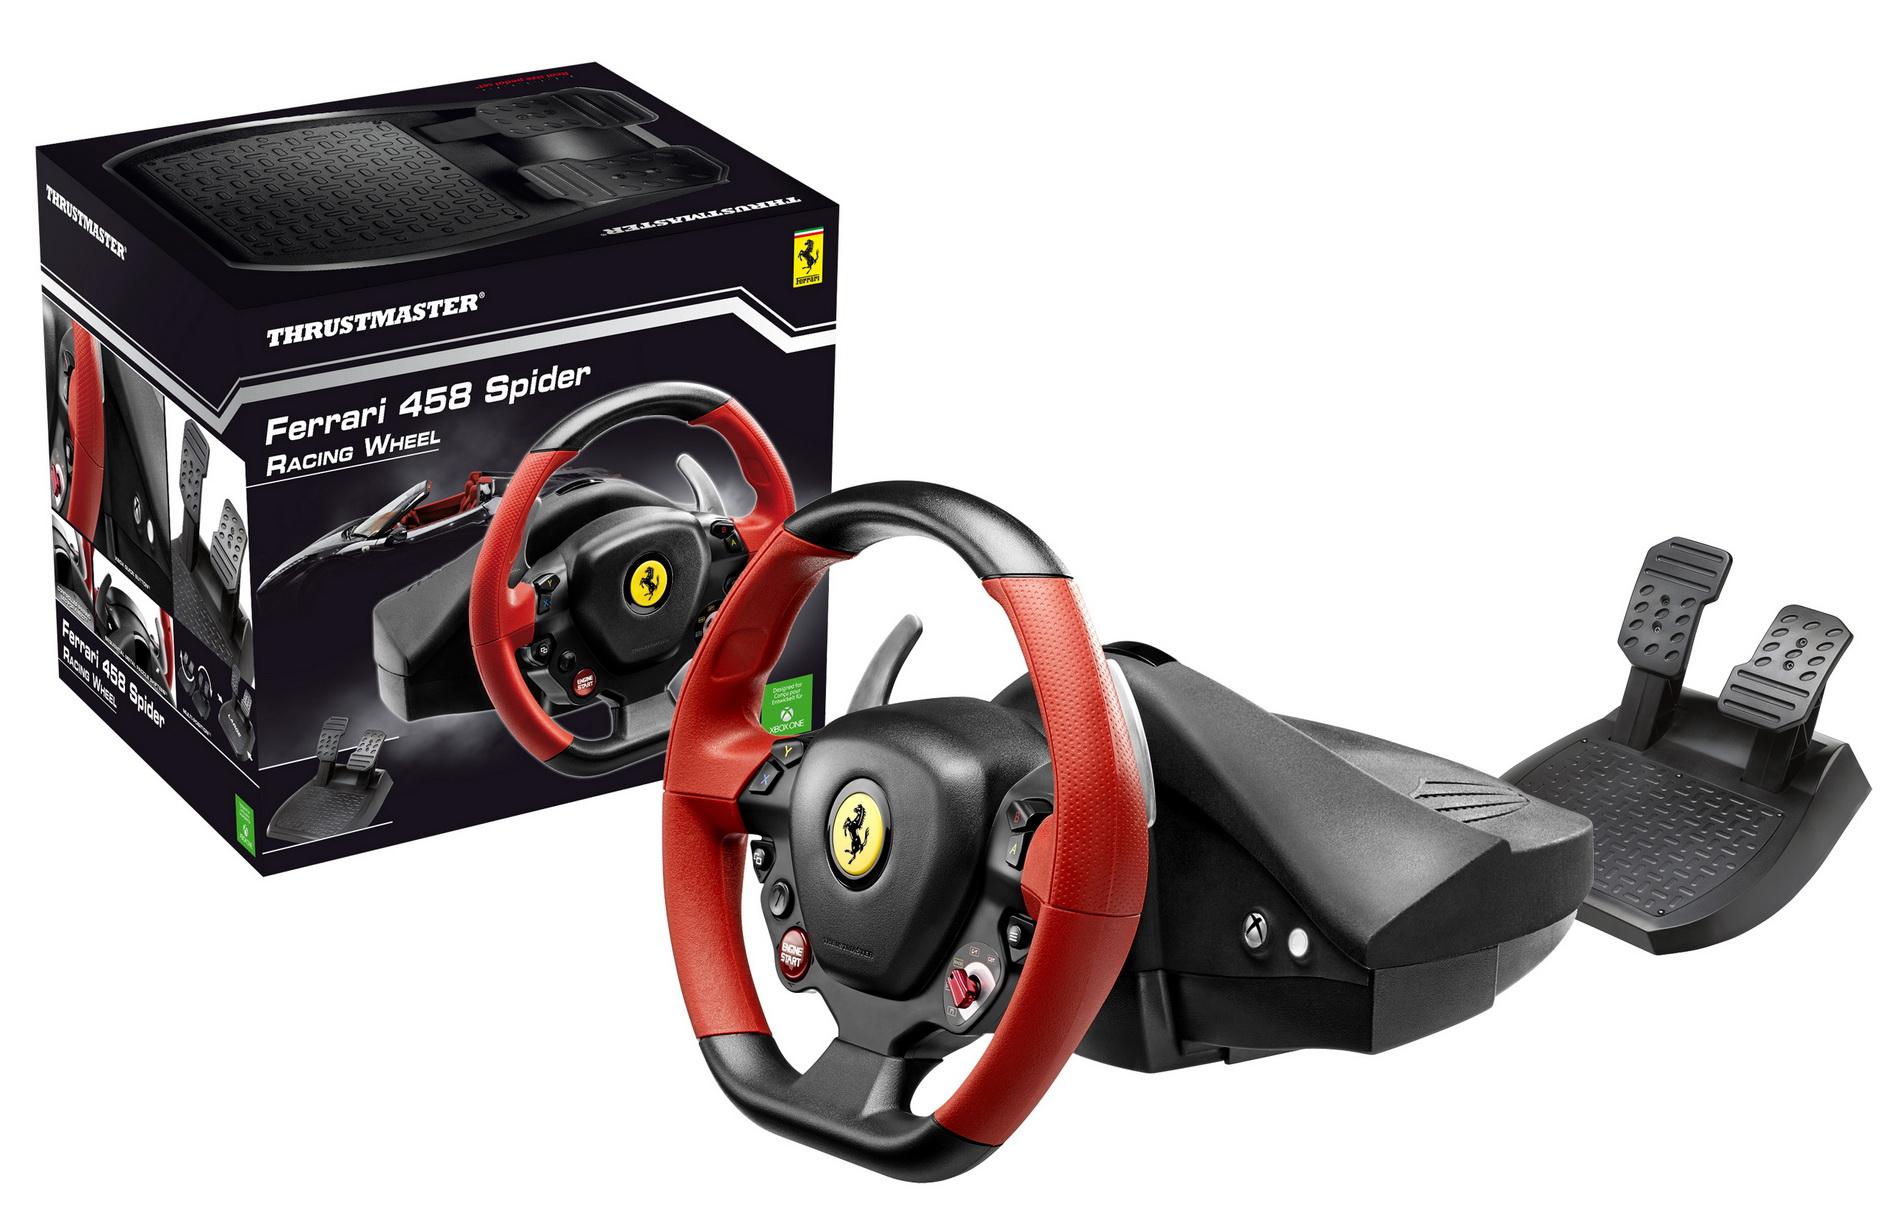 volant thrustmaster ferrari 458 spider xbox one. Black Bedroom Furniture Sets. Home Design Ideas